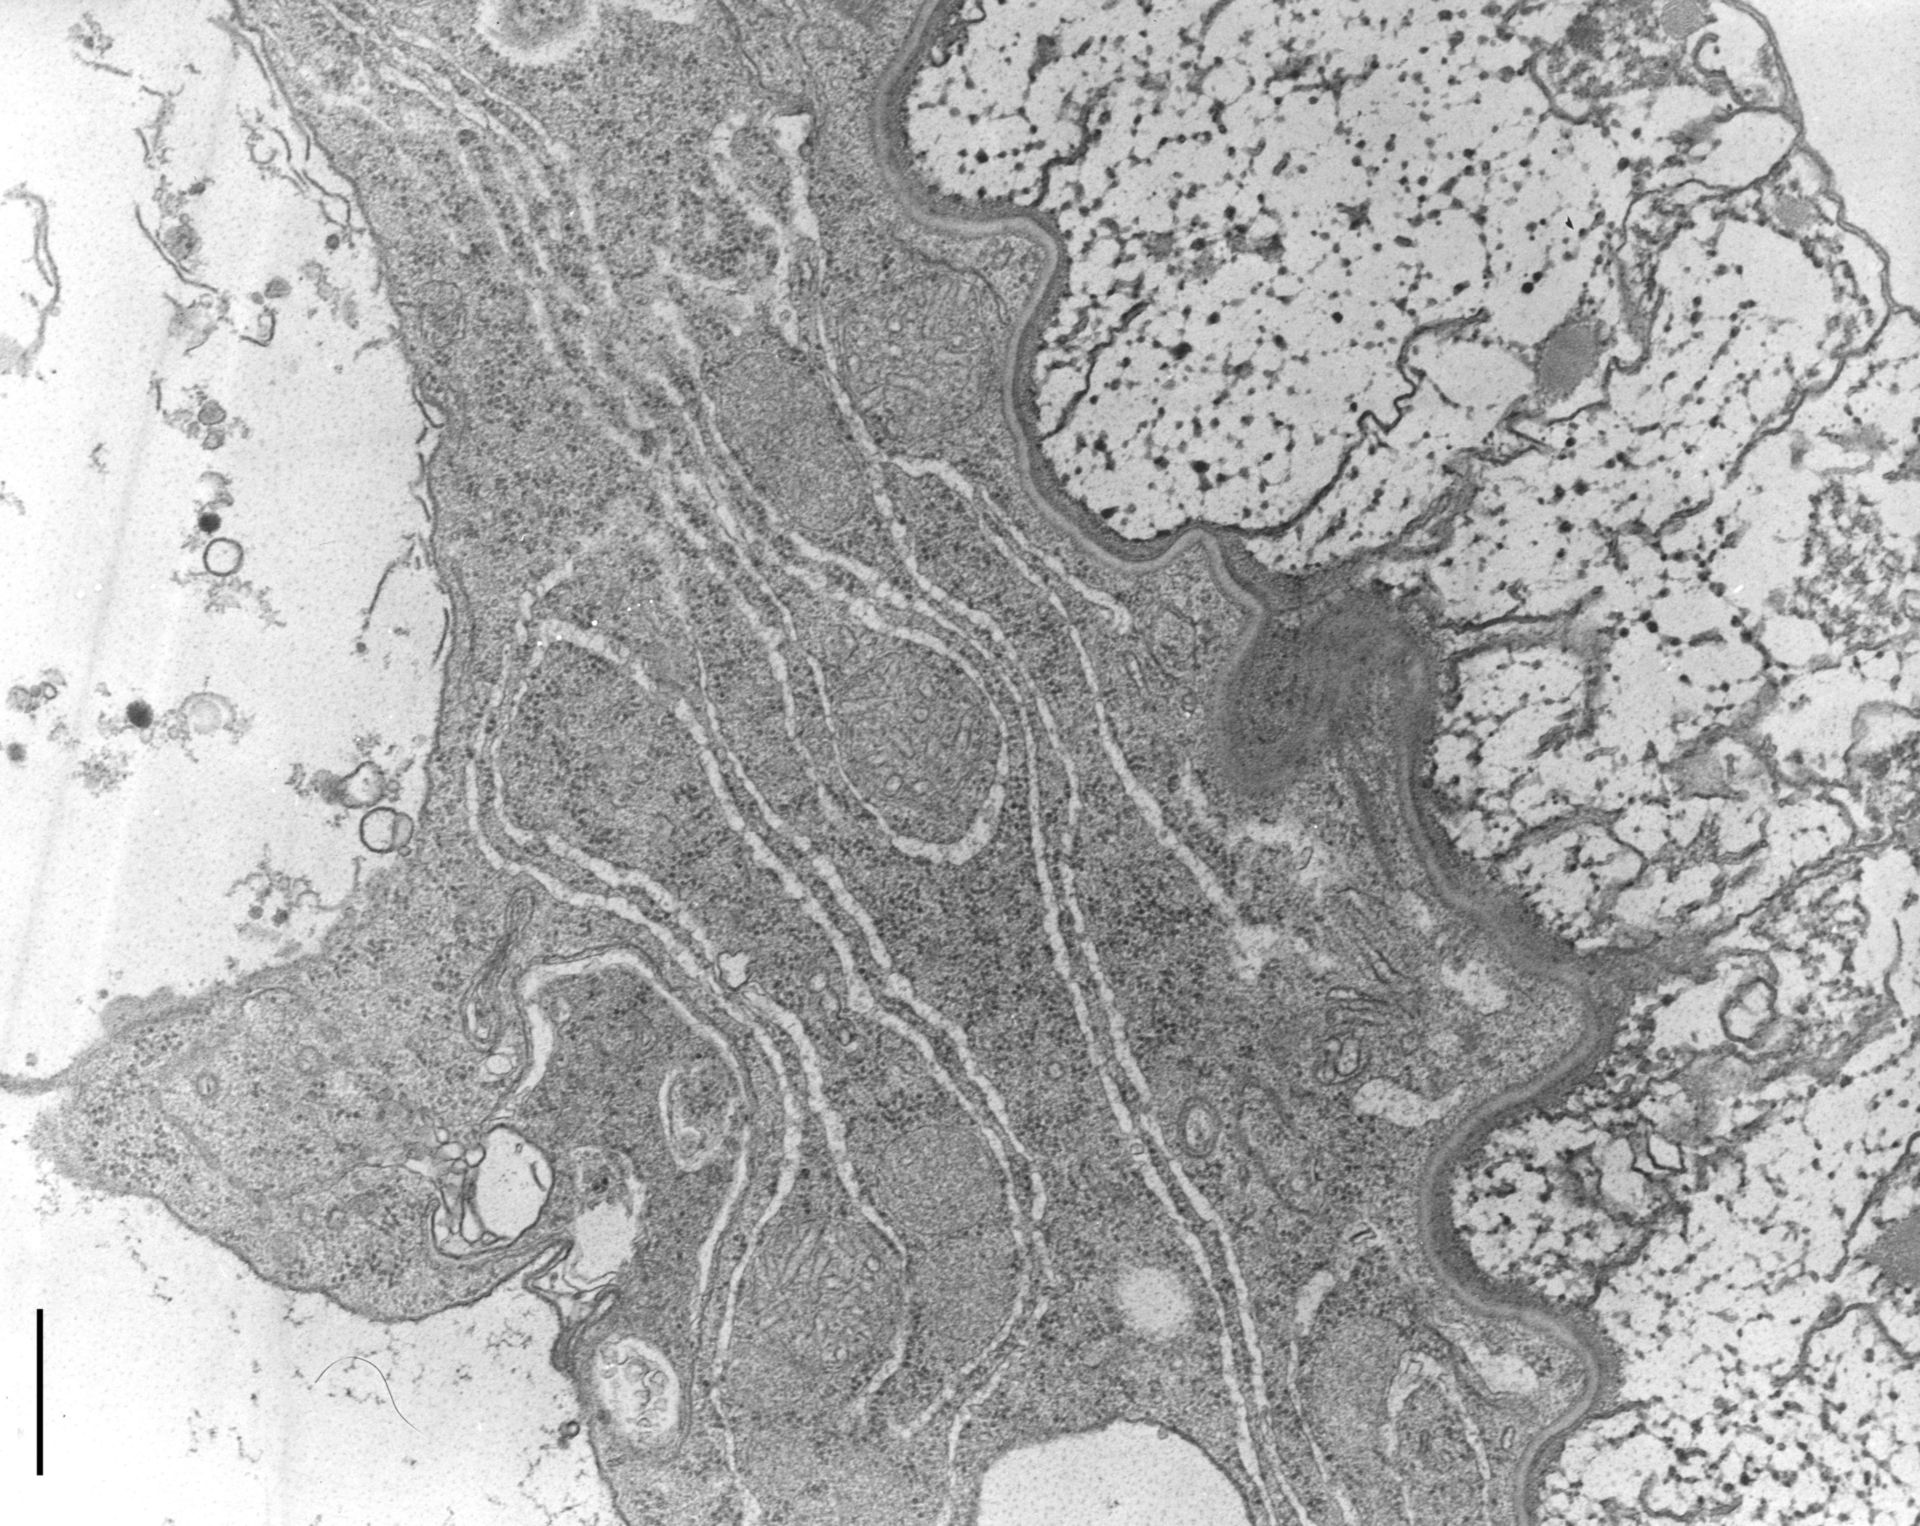 Nassula (mitocondrio tubulare) - CIL:9833